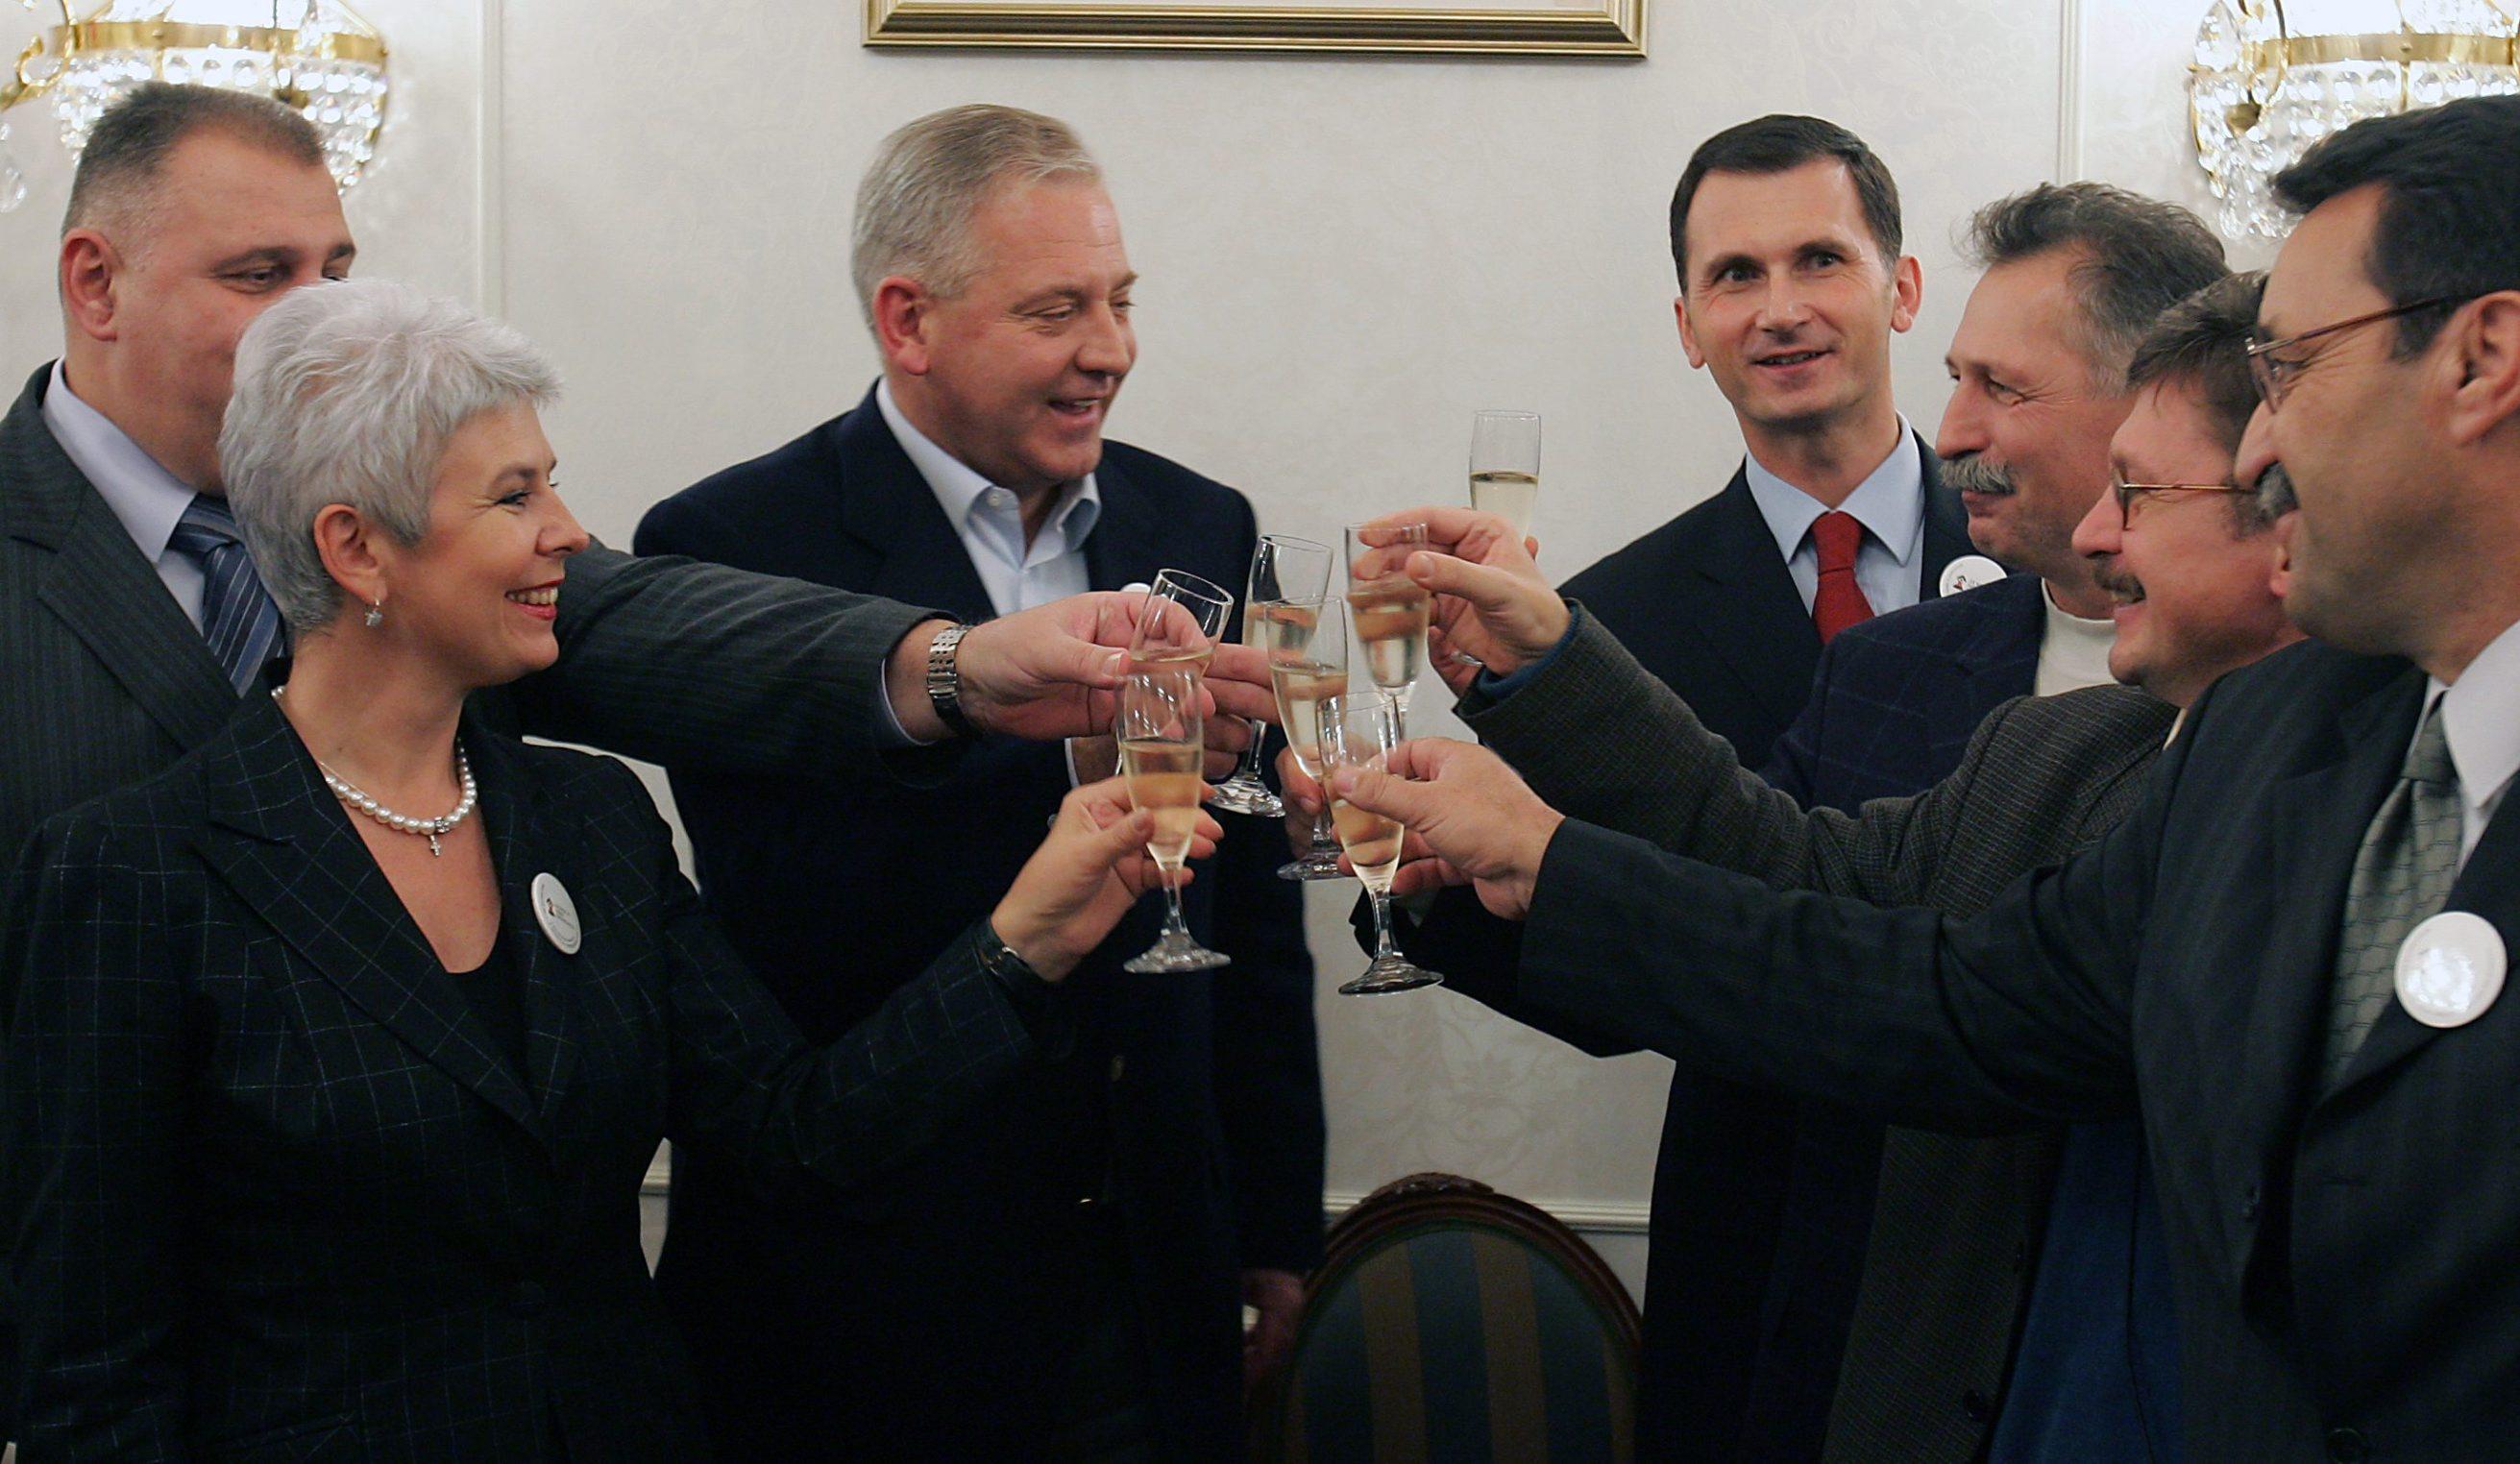 Ivan Šuker, Jadranka Kosor, Ivo Sanader, Dragan Primorac, Branimir Mihalinec i Vilim Ribić